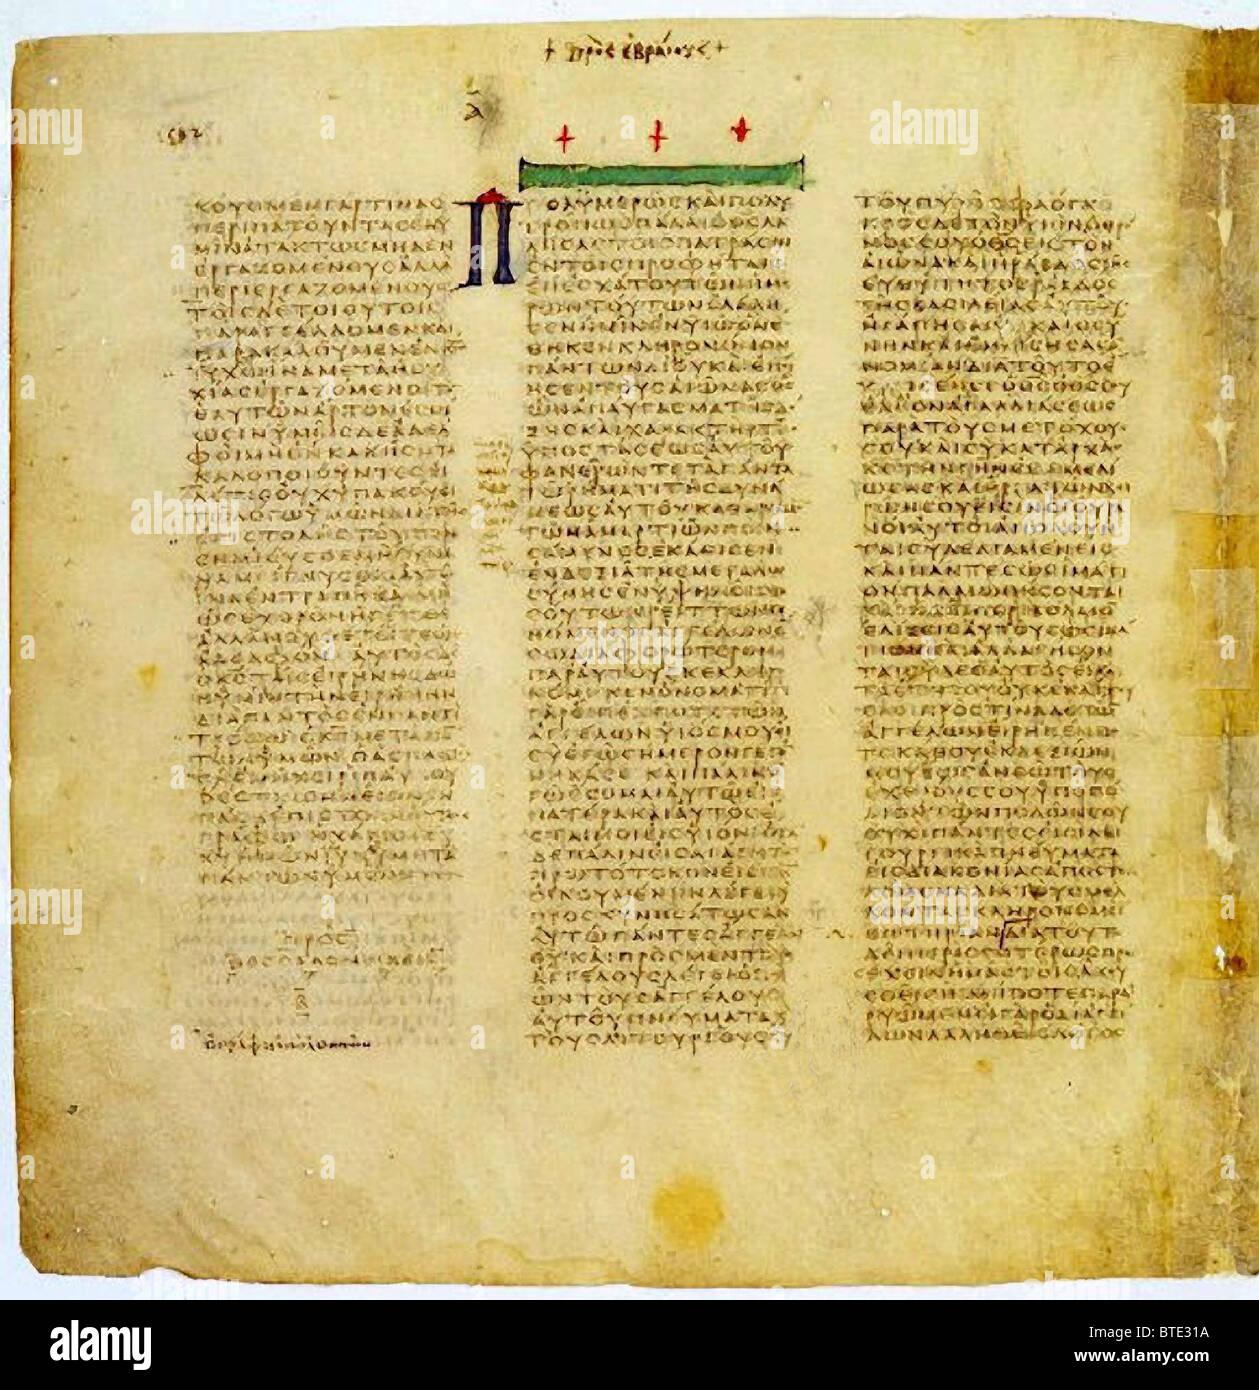 5396  Codex Sinaiticus is a 4th century manuscript of the